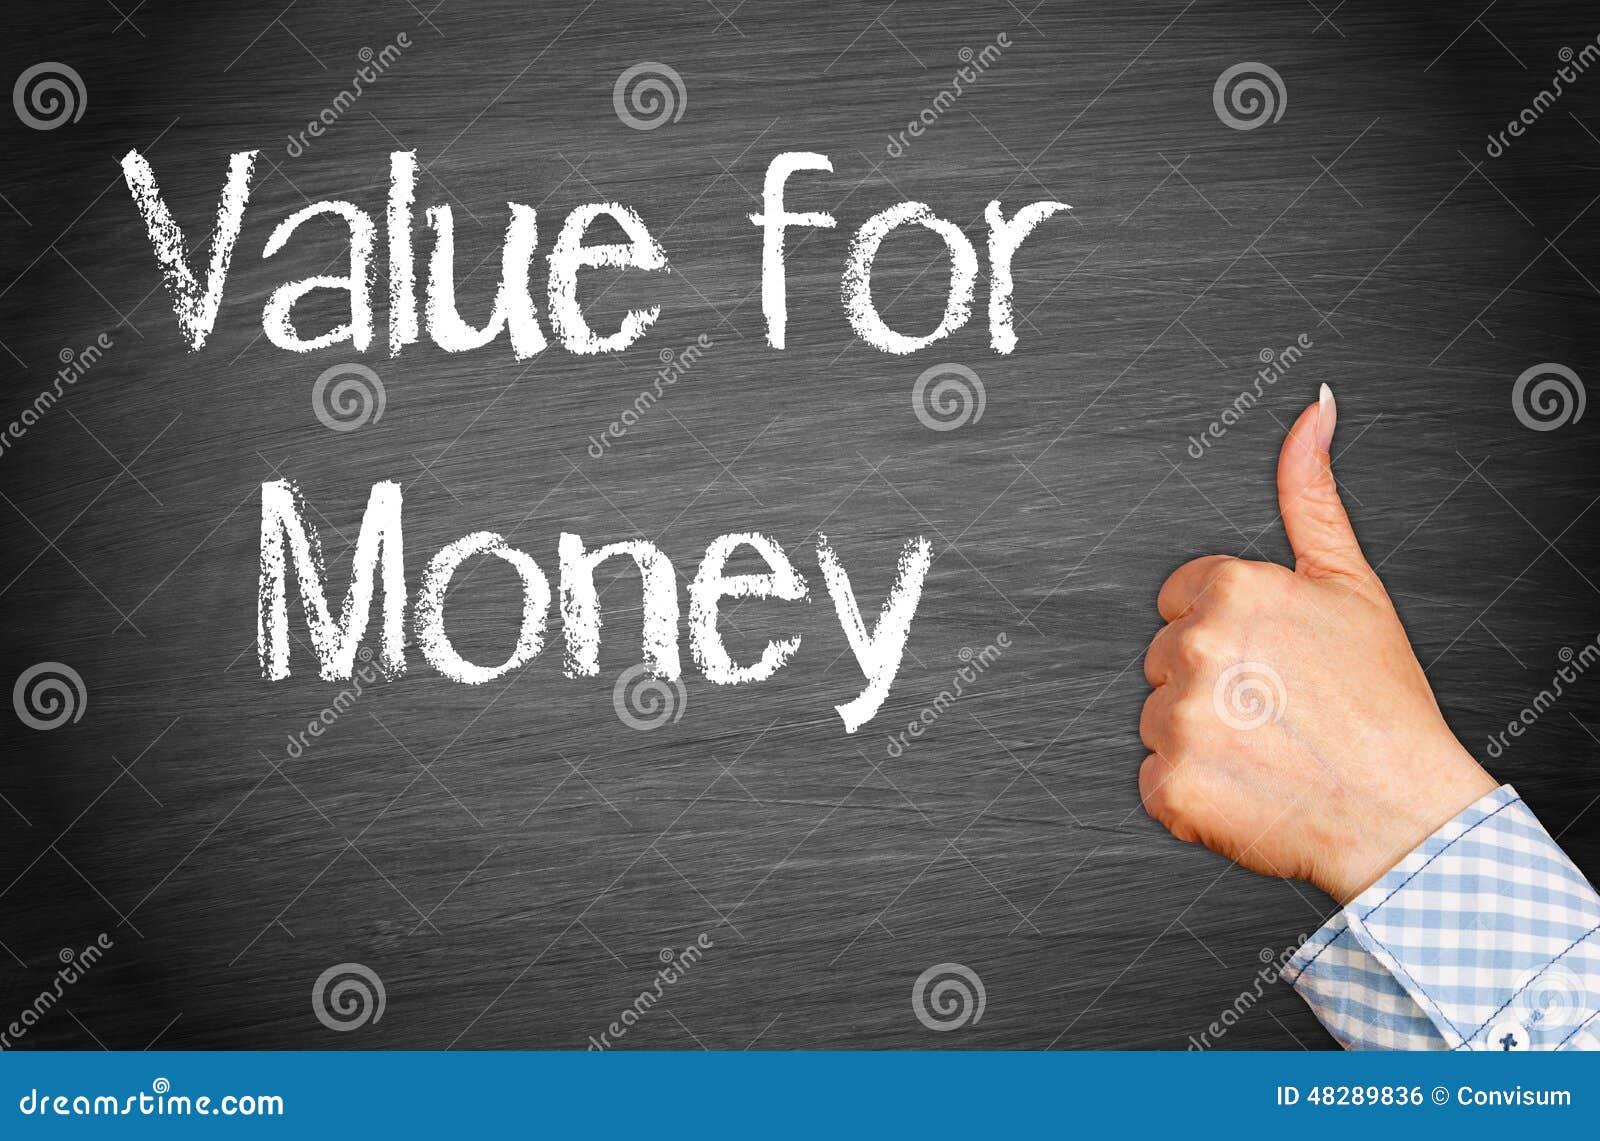 Value For Money Stock Photo. Image Of Merit, Writing